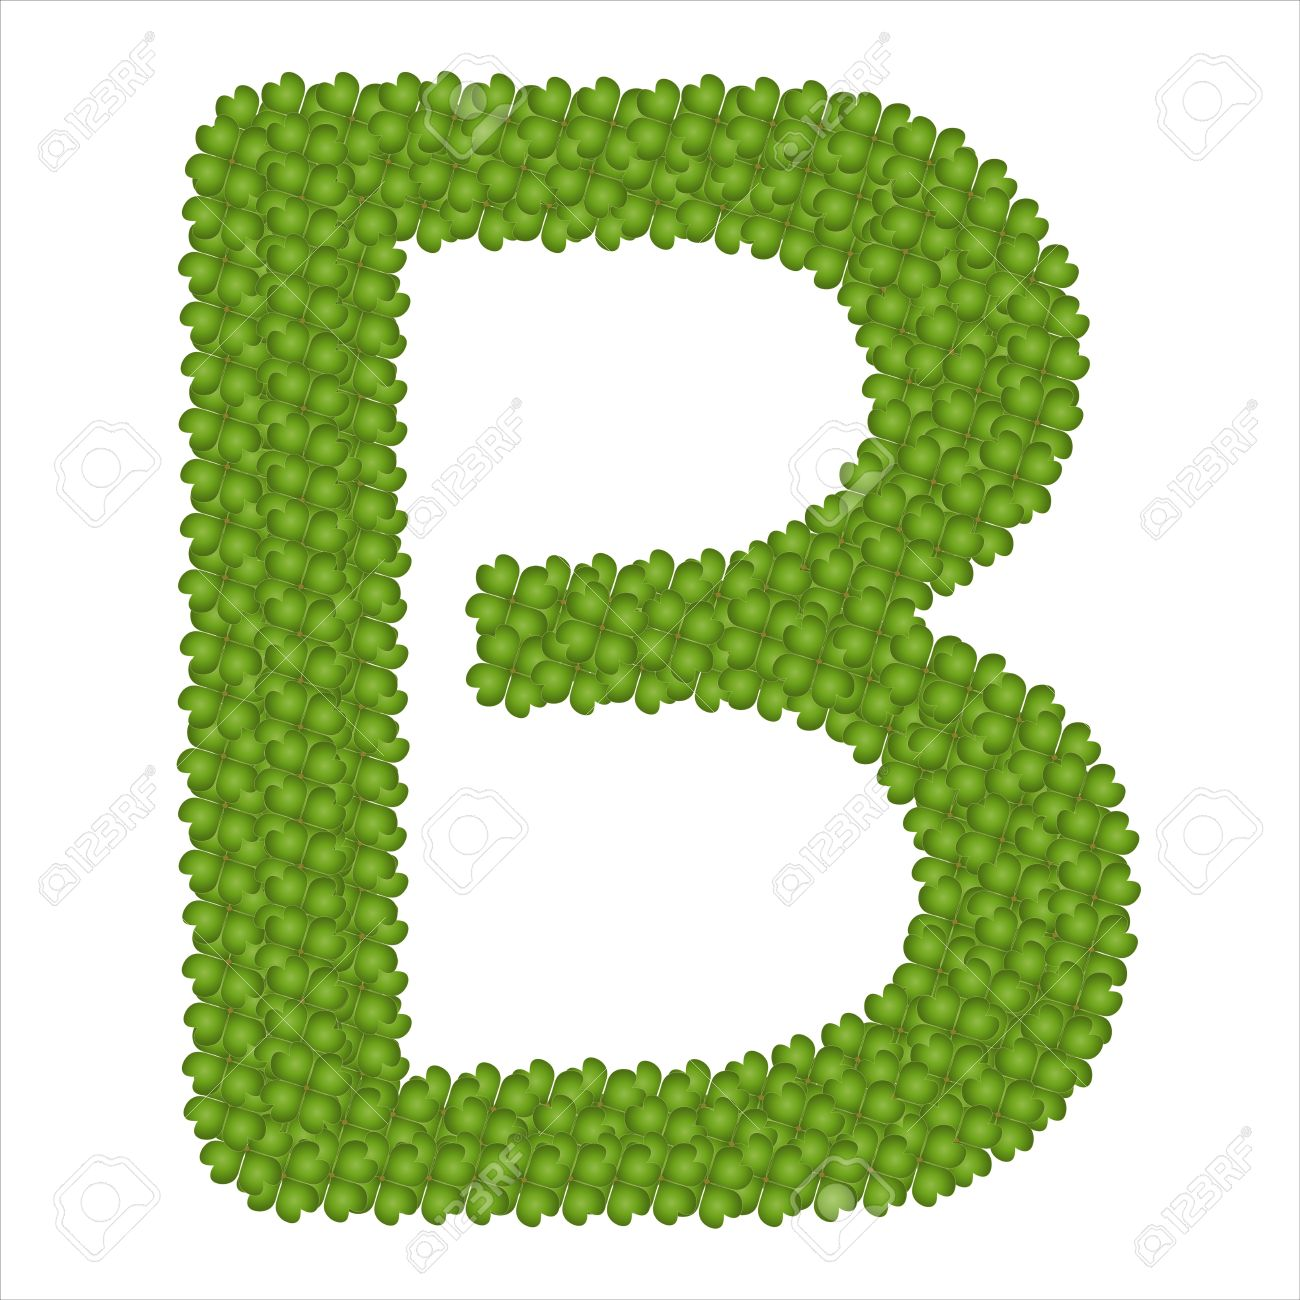 Shamrock alphabet letter clipart jpg royalty free Letter B, Alphabet Letters Made Of Four Leaf Clover Isolated ... jpg royalty free